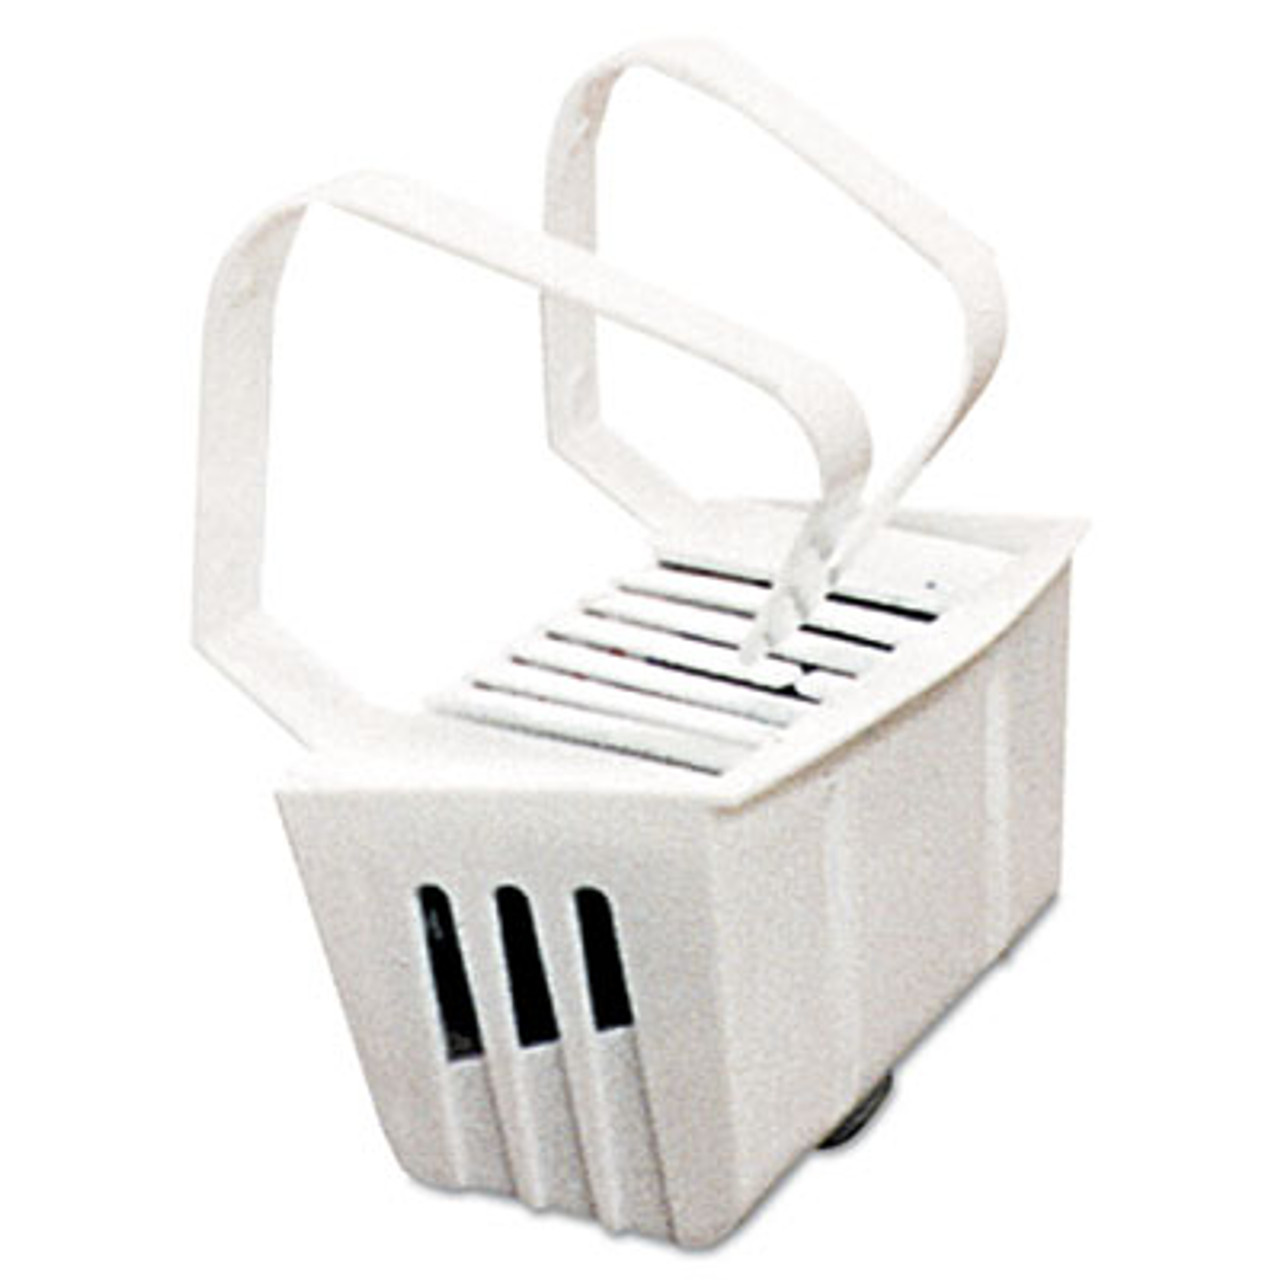 Bgd 661 19 50 Non Para Toilet Bowl Block Lasts 30 Days White Evergreen Fragrance 12 Box